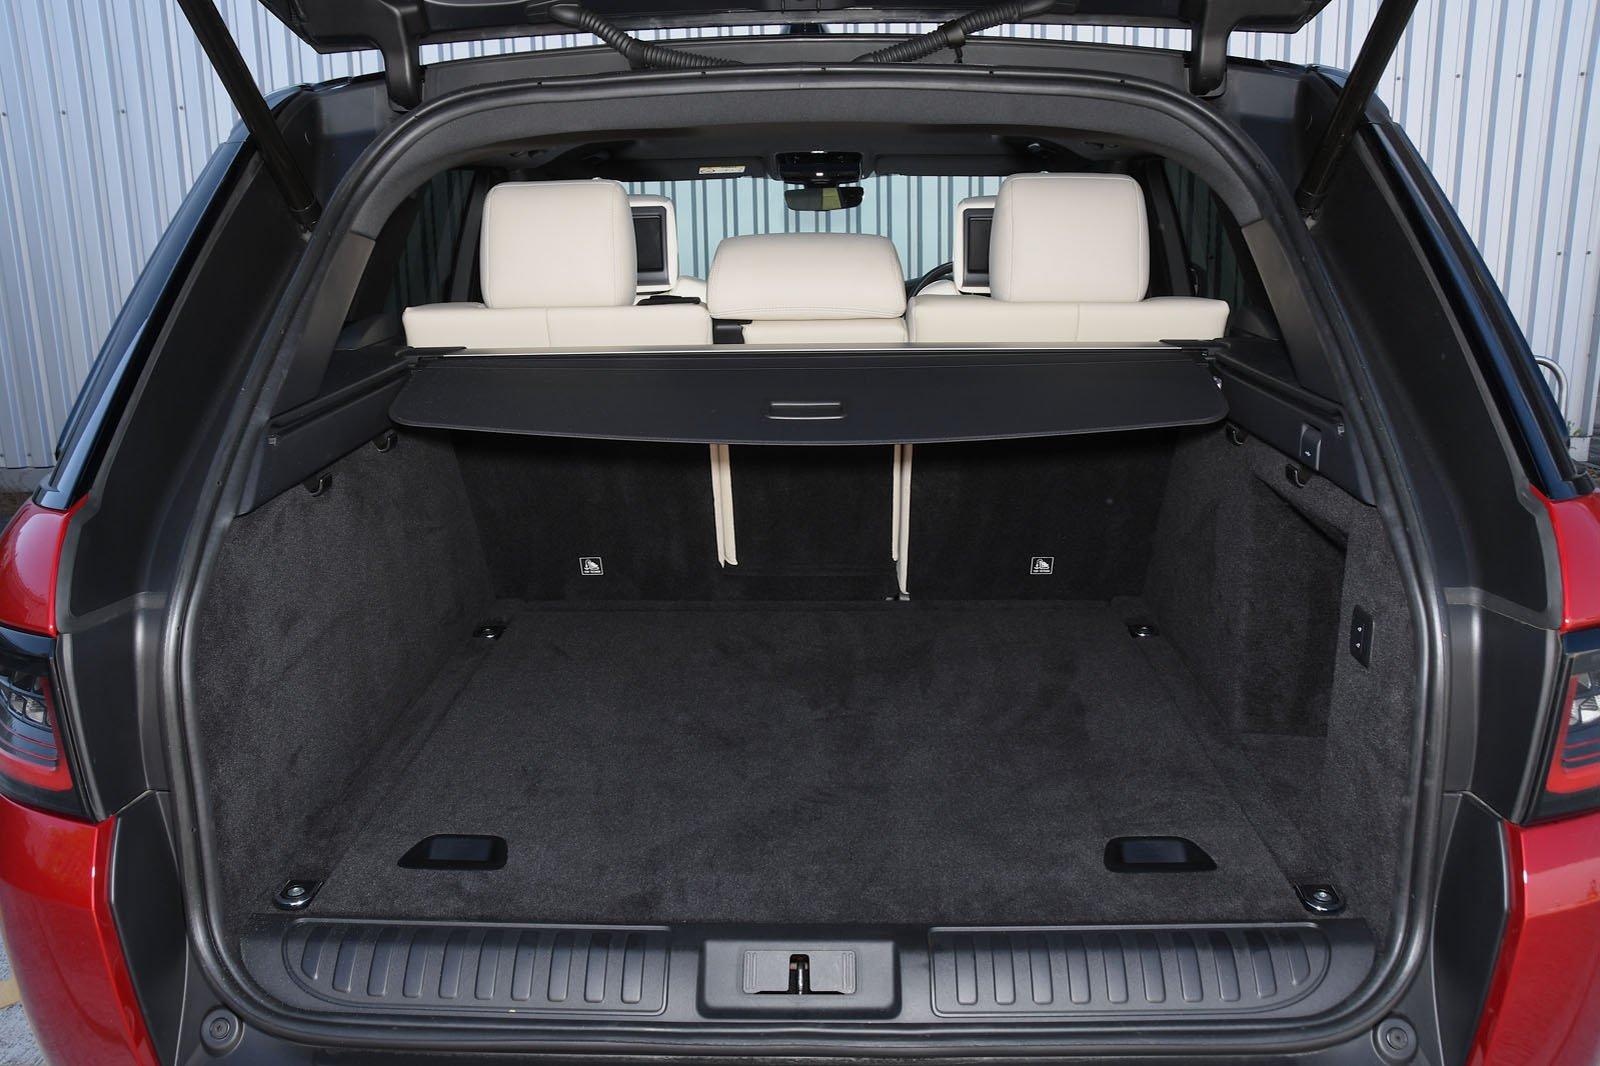 2018 Range Rover Sport boot